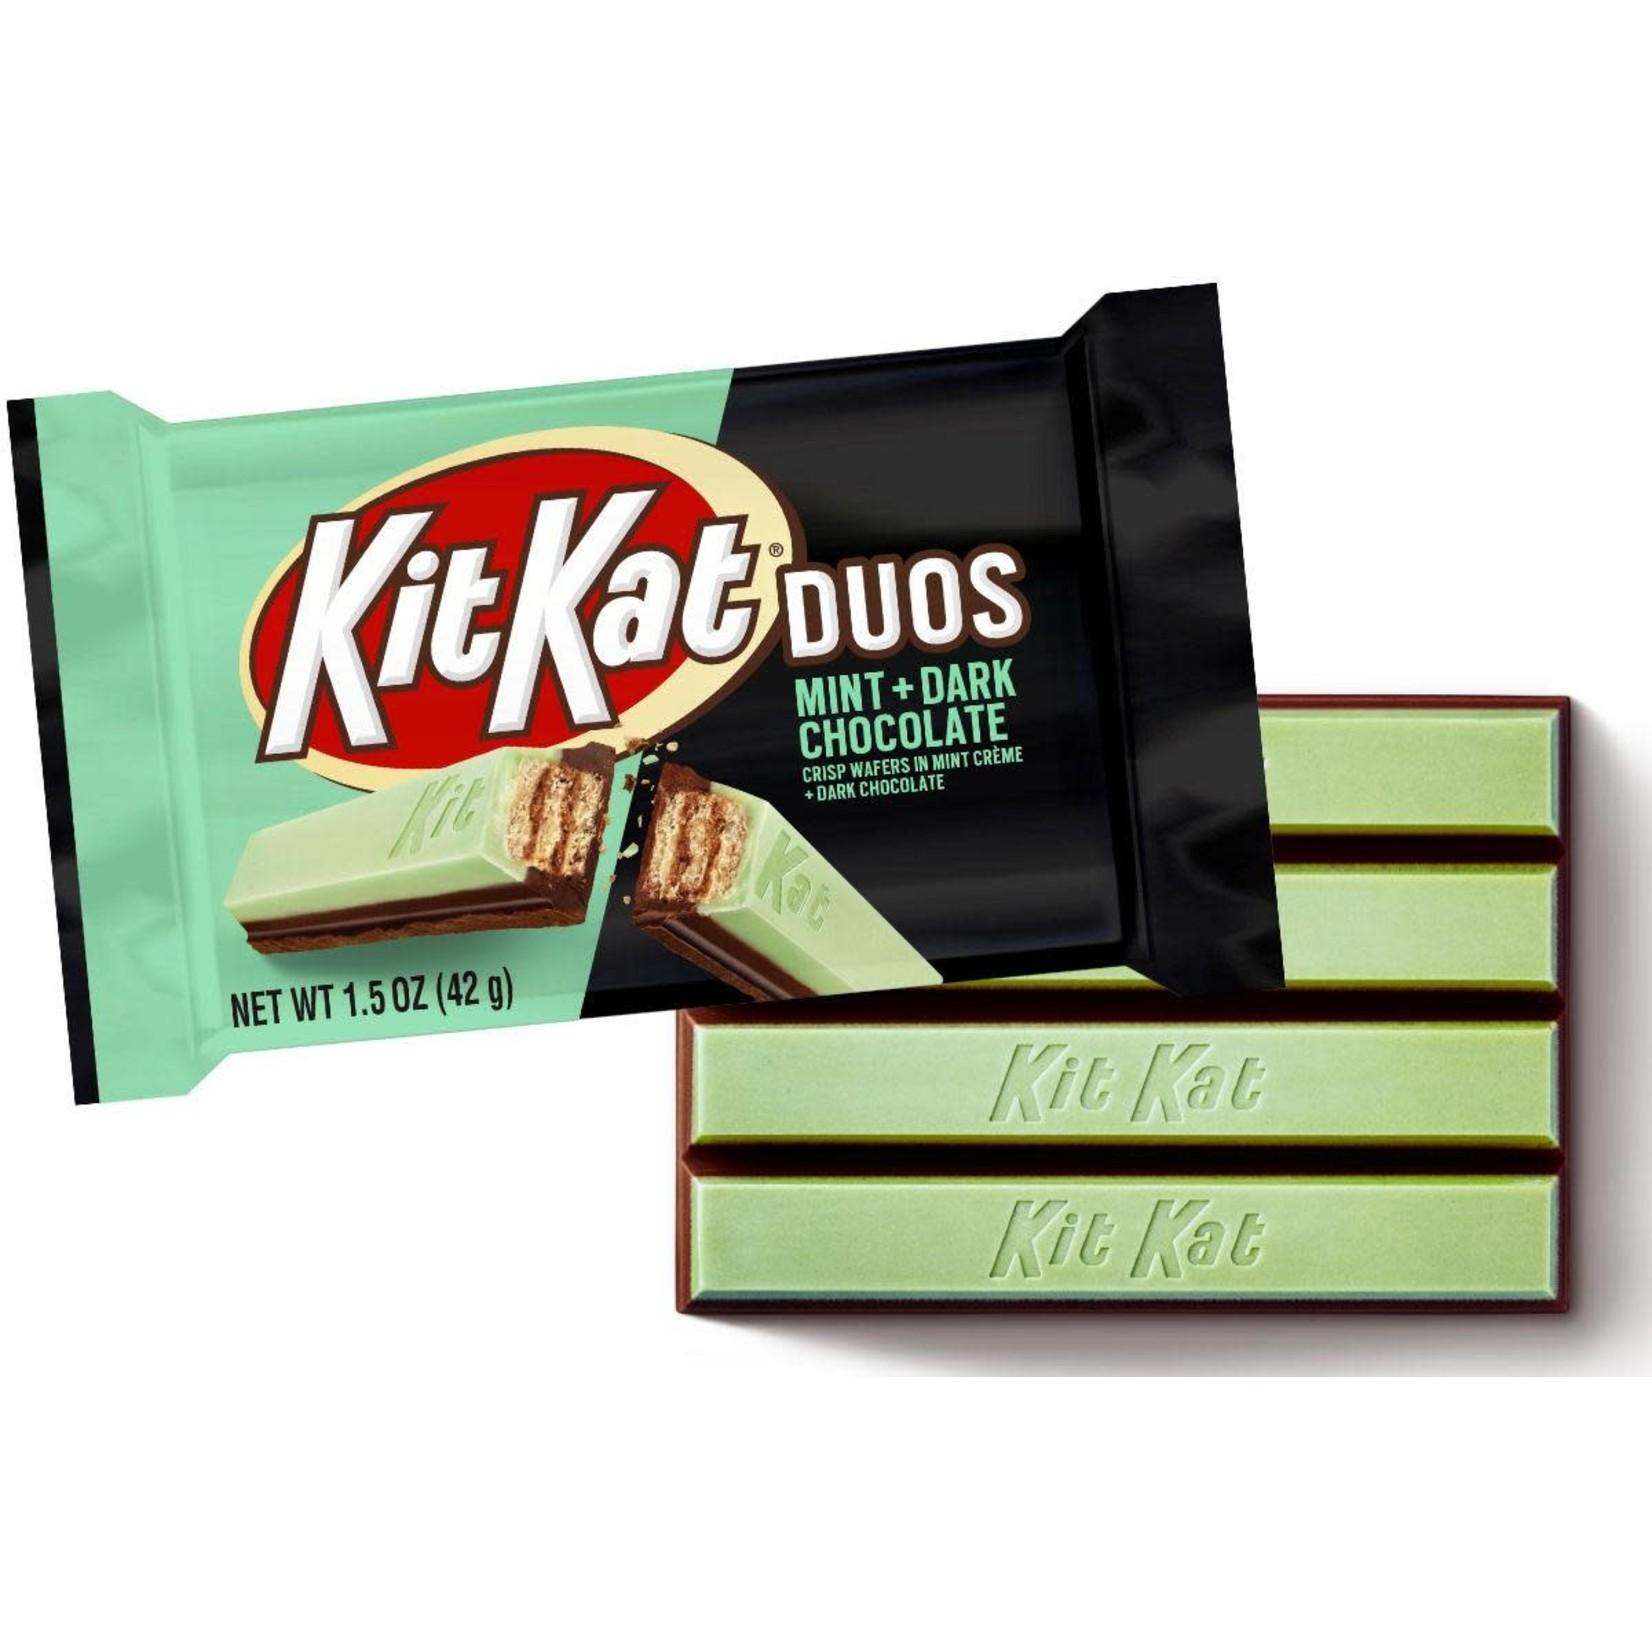 Kit Kat Duos Mint, 42g